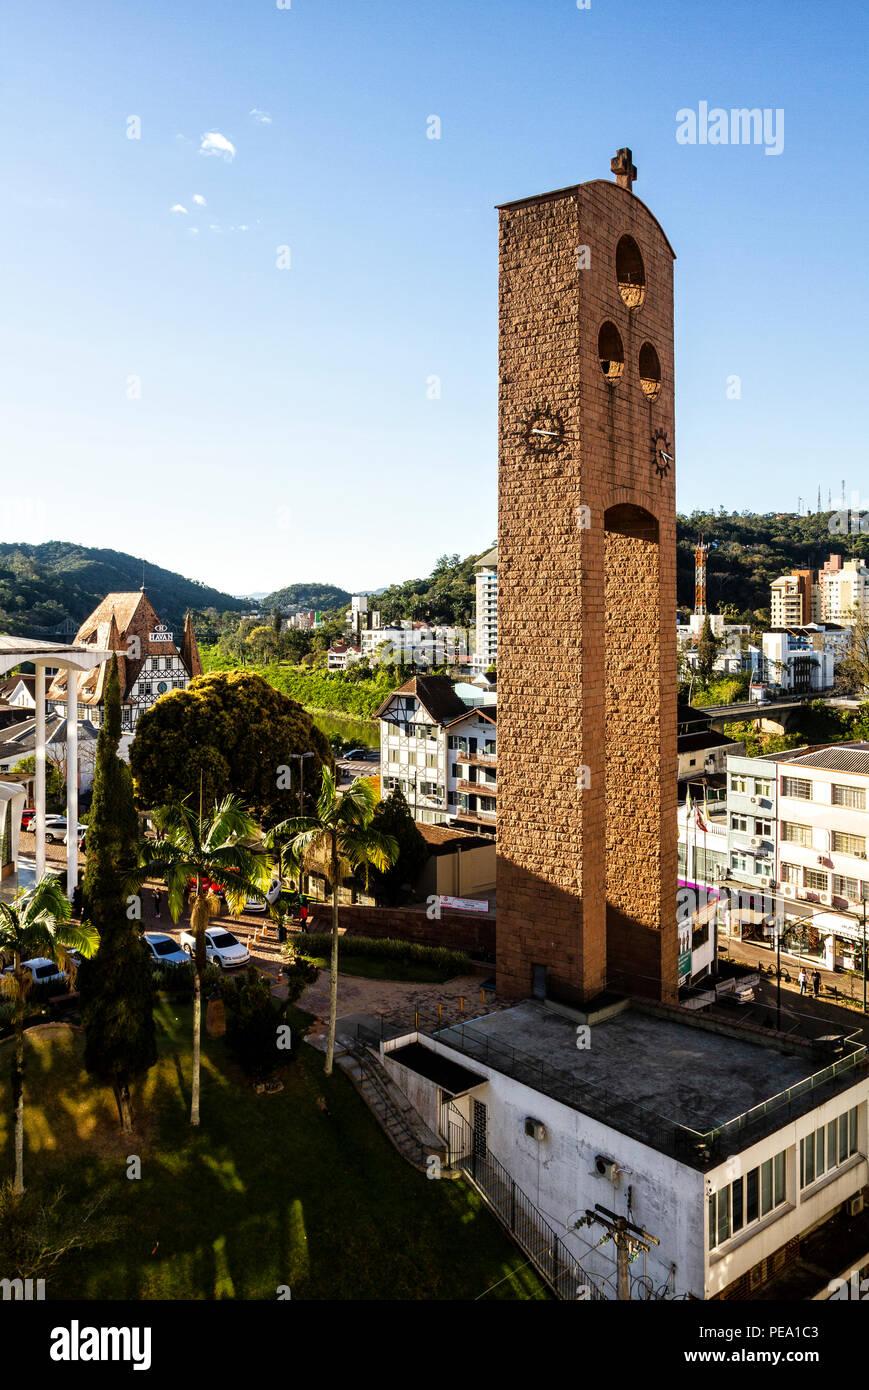 Catedral de San Pablo Apóstol. Blumenau, Santa Catarina, Brasil. Imagen De Stock